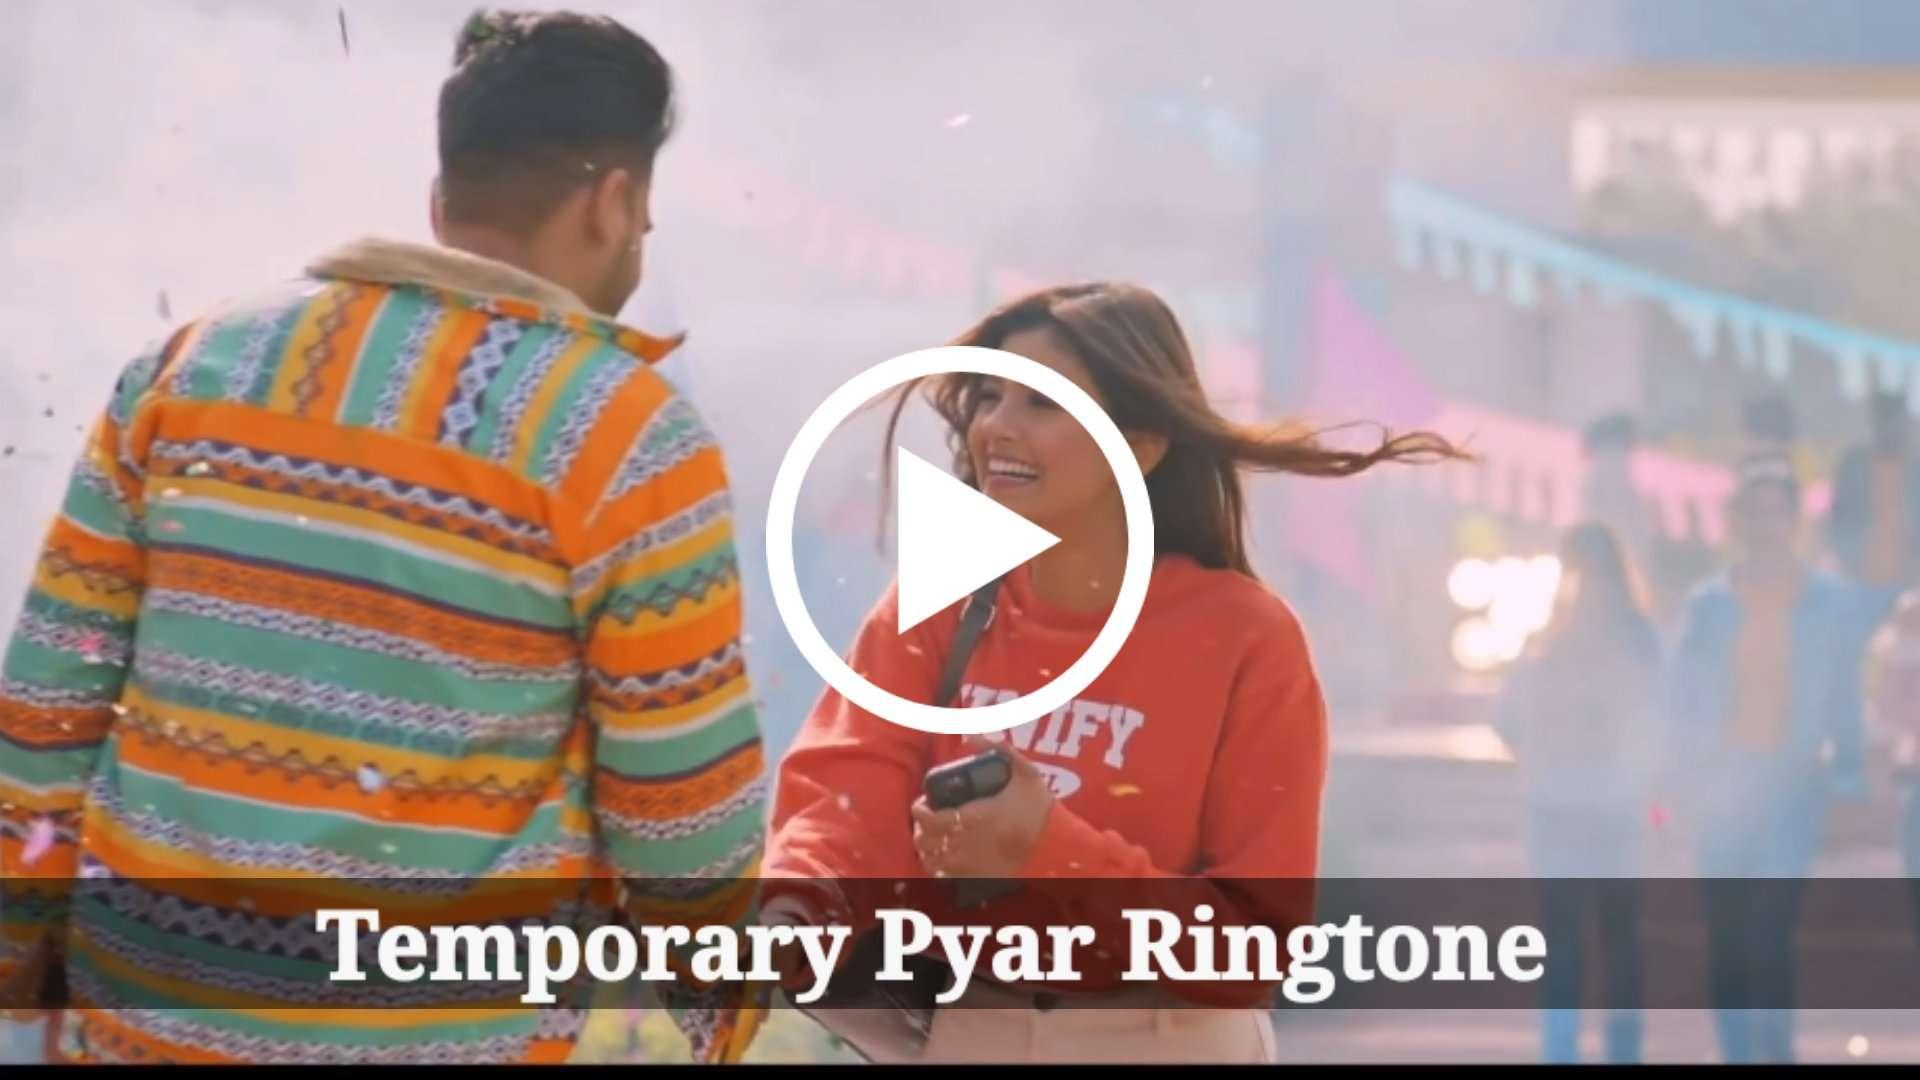 Temporary Pyar Mp3 Ringtone DownloadTemporary Pyar Mp3 Ringtone Download